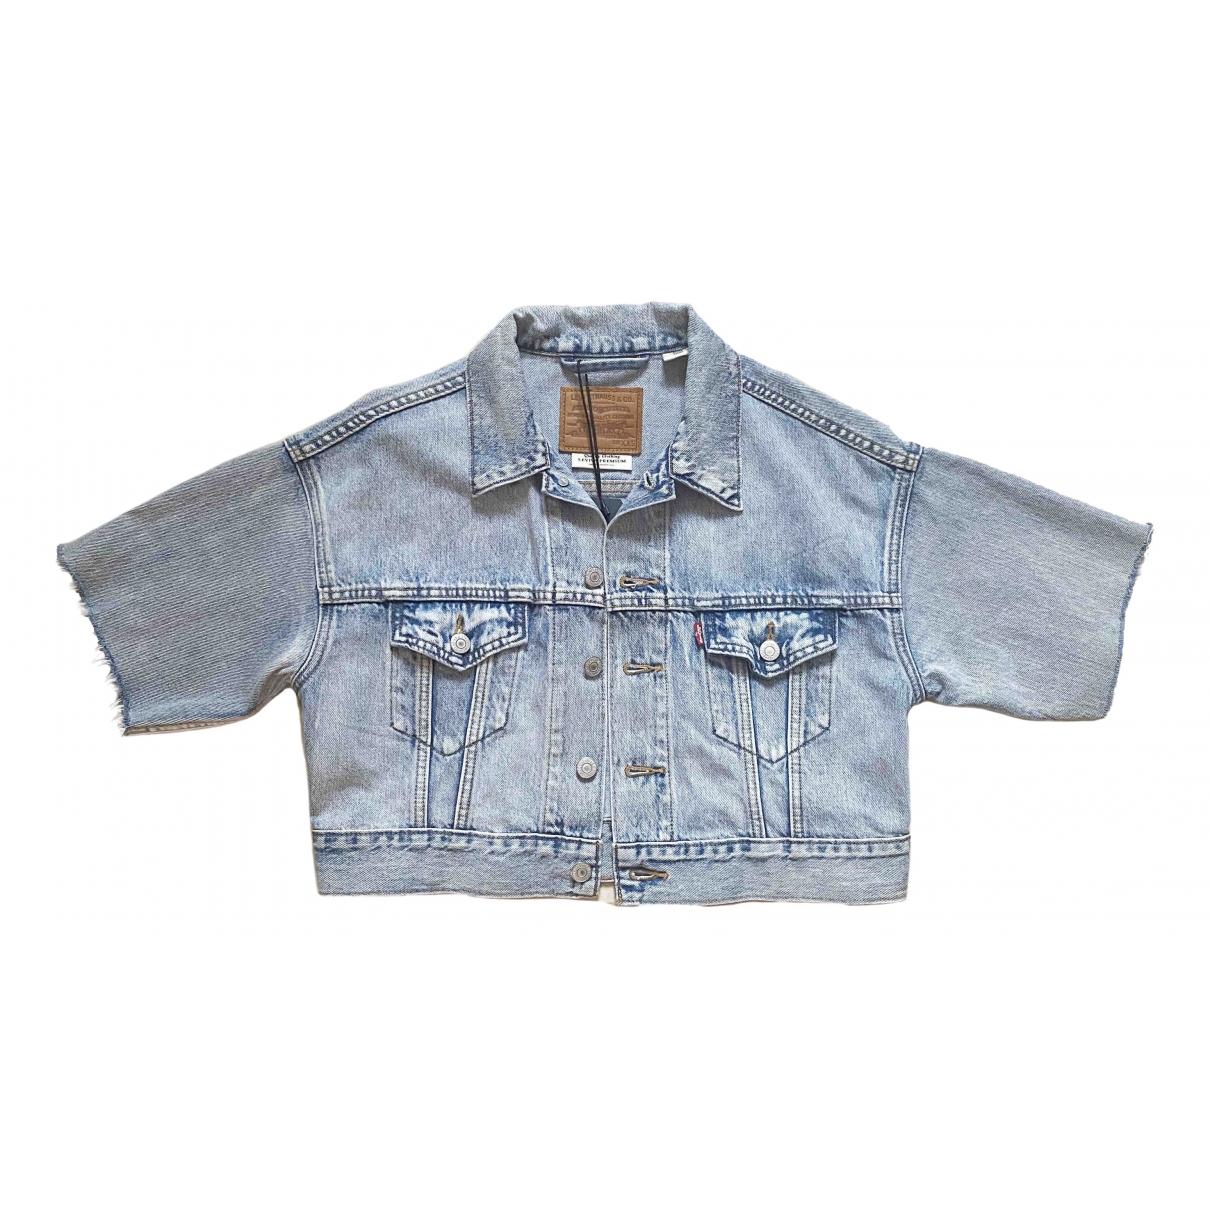 Levi's \N Blue Denim - Jeans jacket for Women XXS International